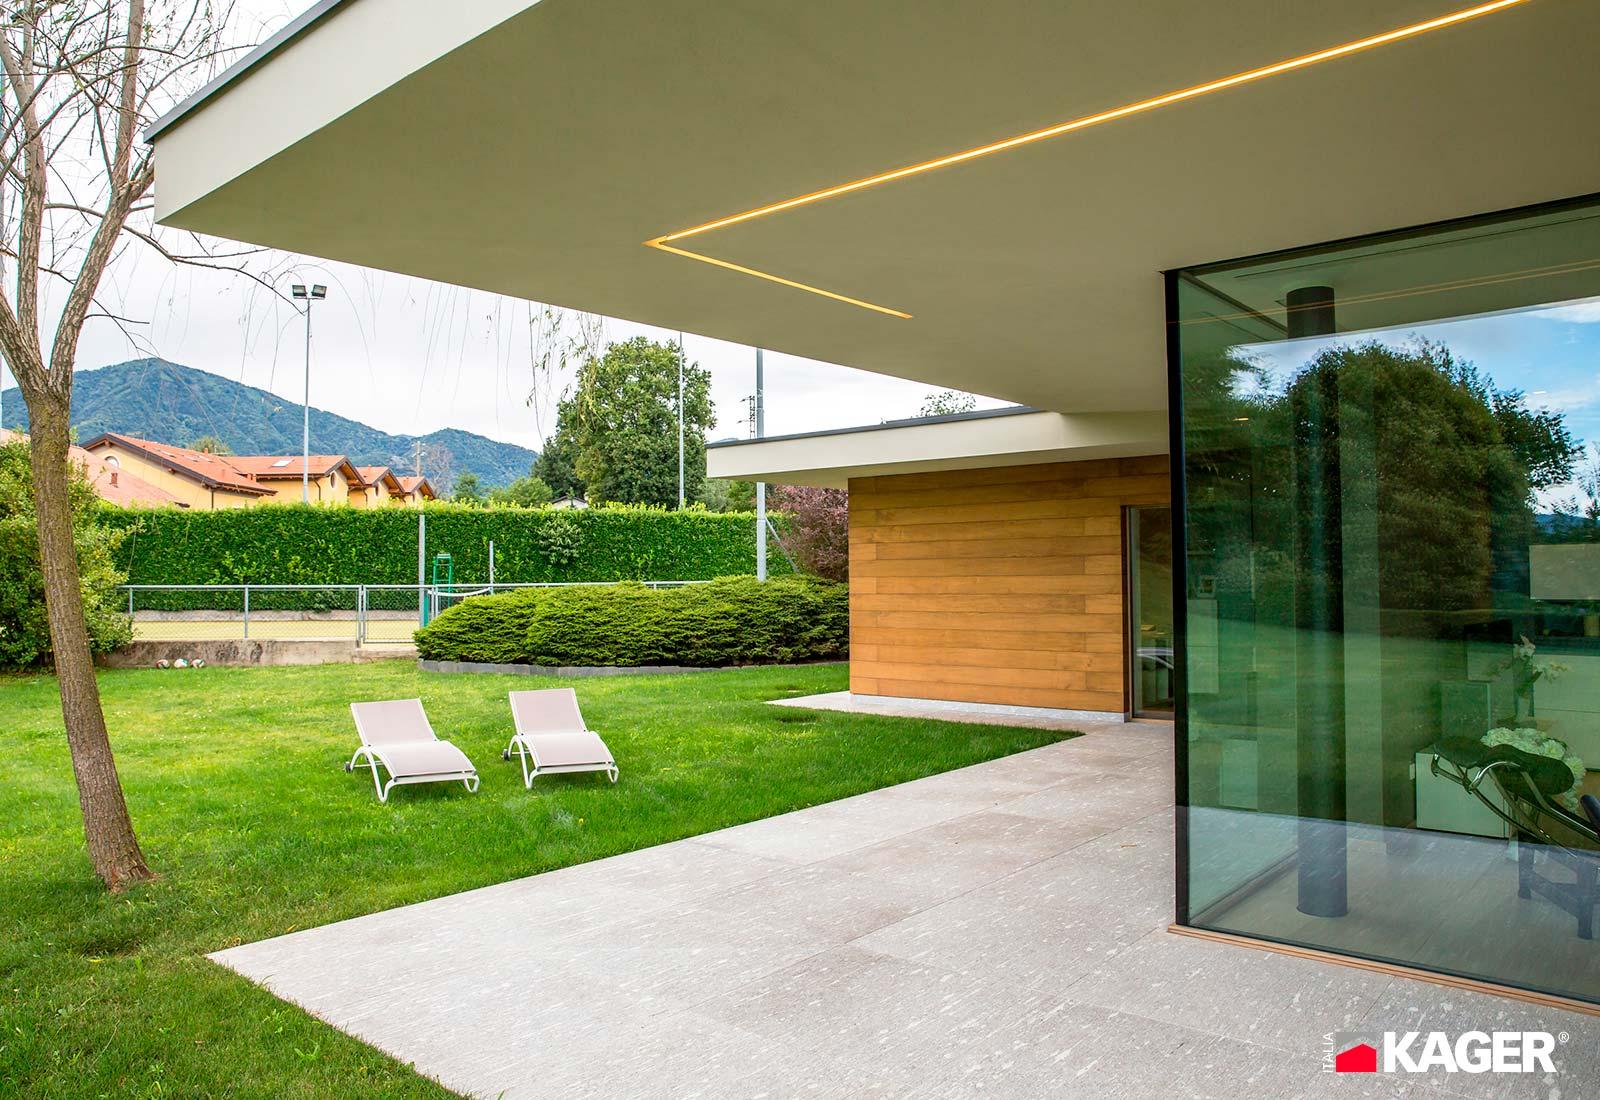 Casa-in-legno-Novara-Kager-Italia-04